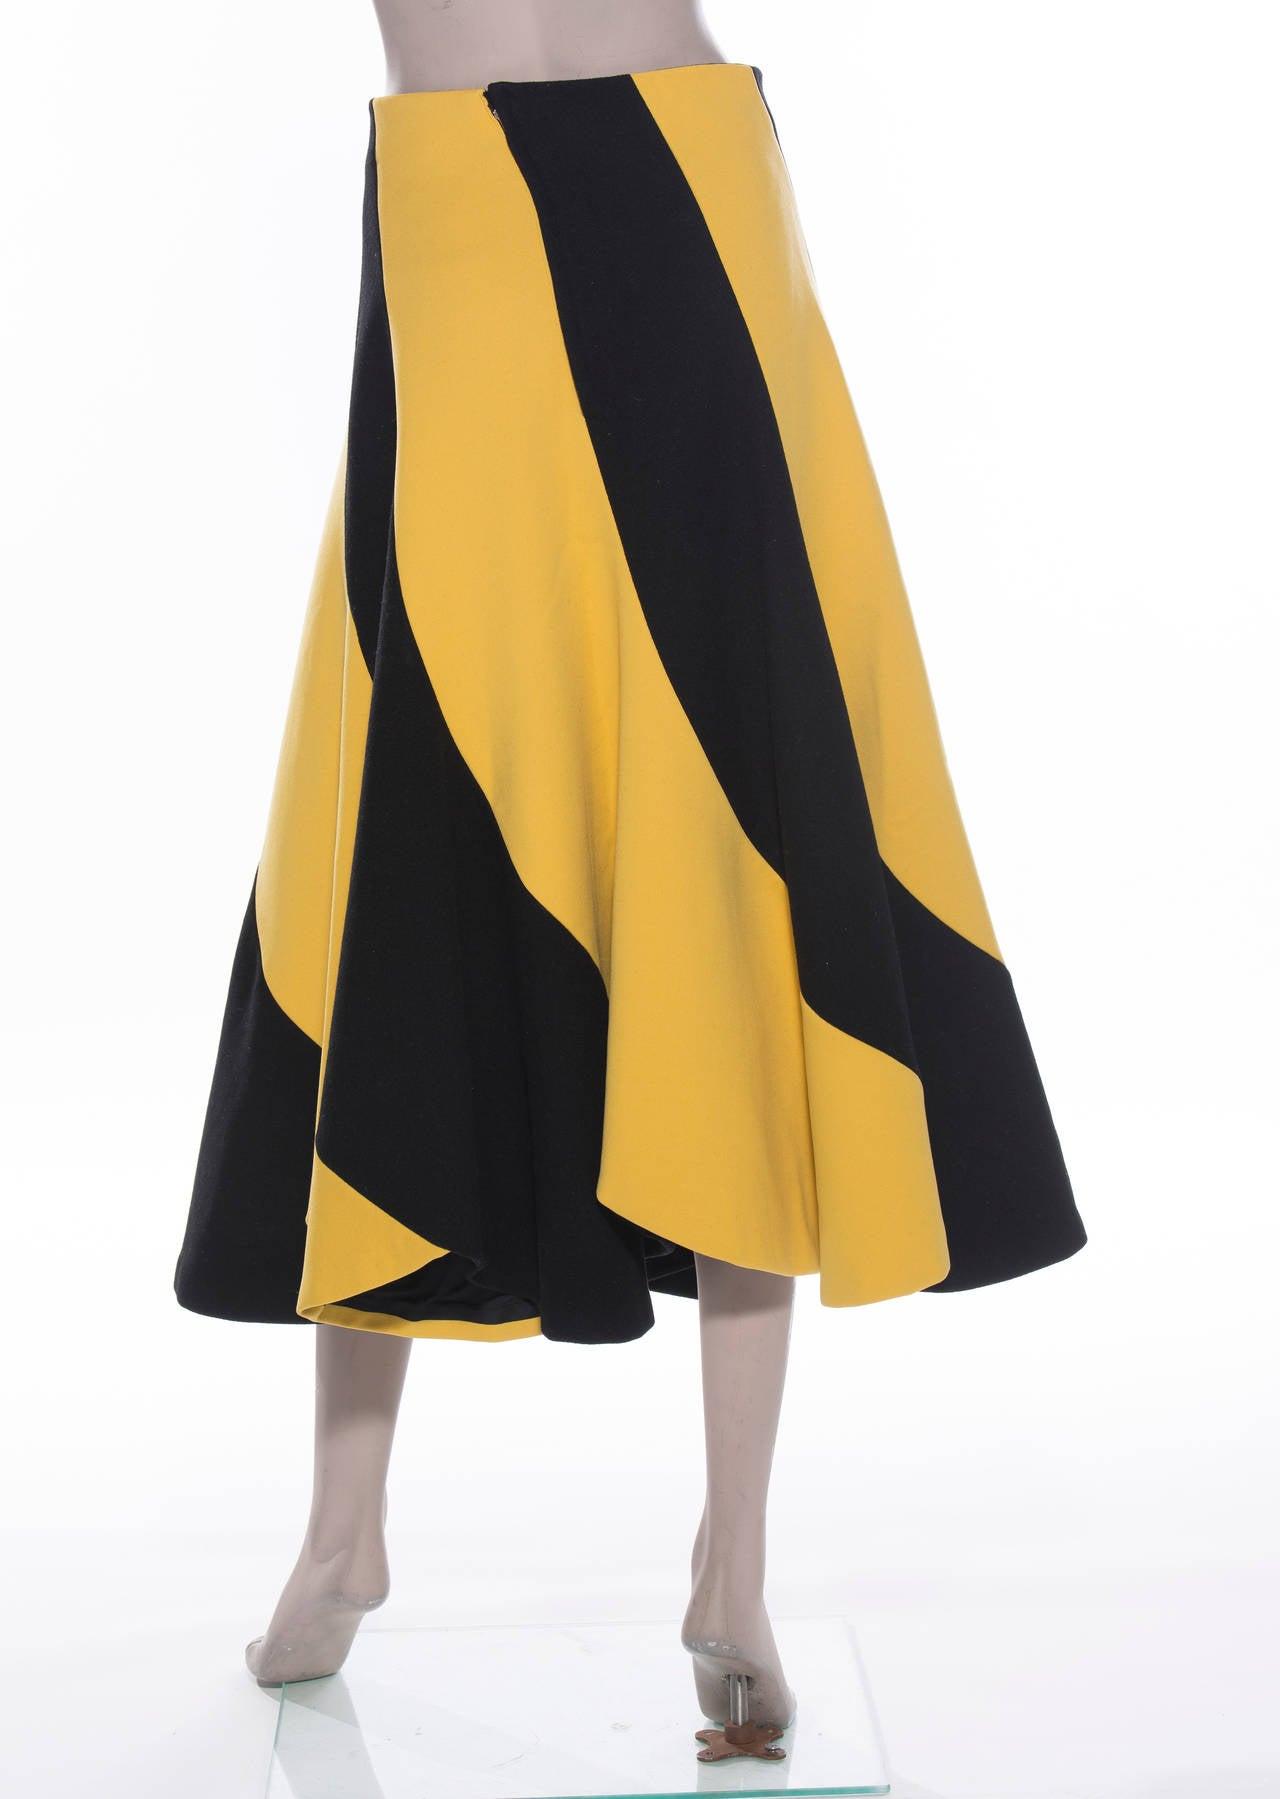 Yohji Yamamoto Circle Skirt, Circa 1990's 3